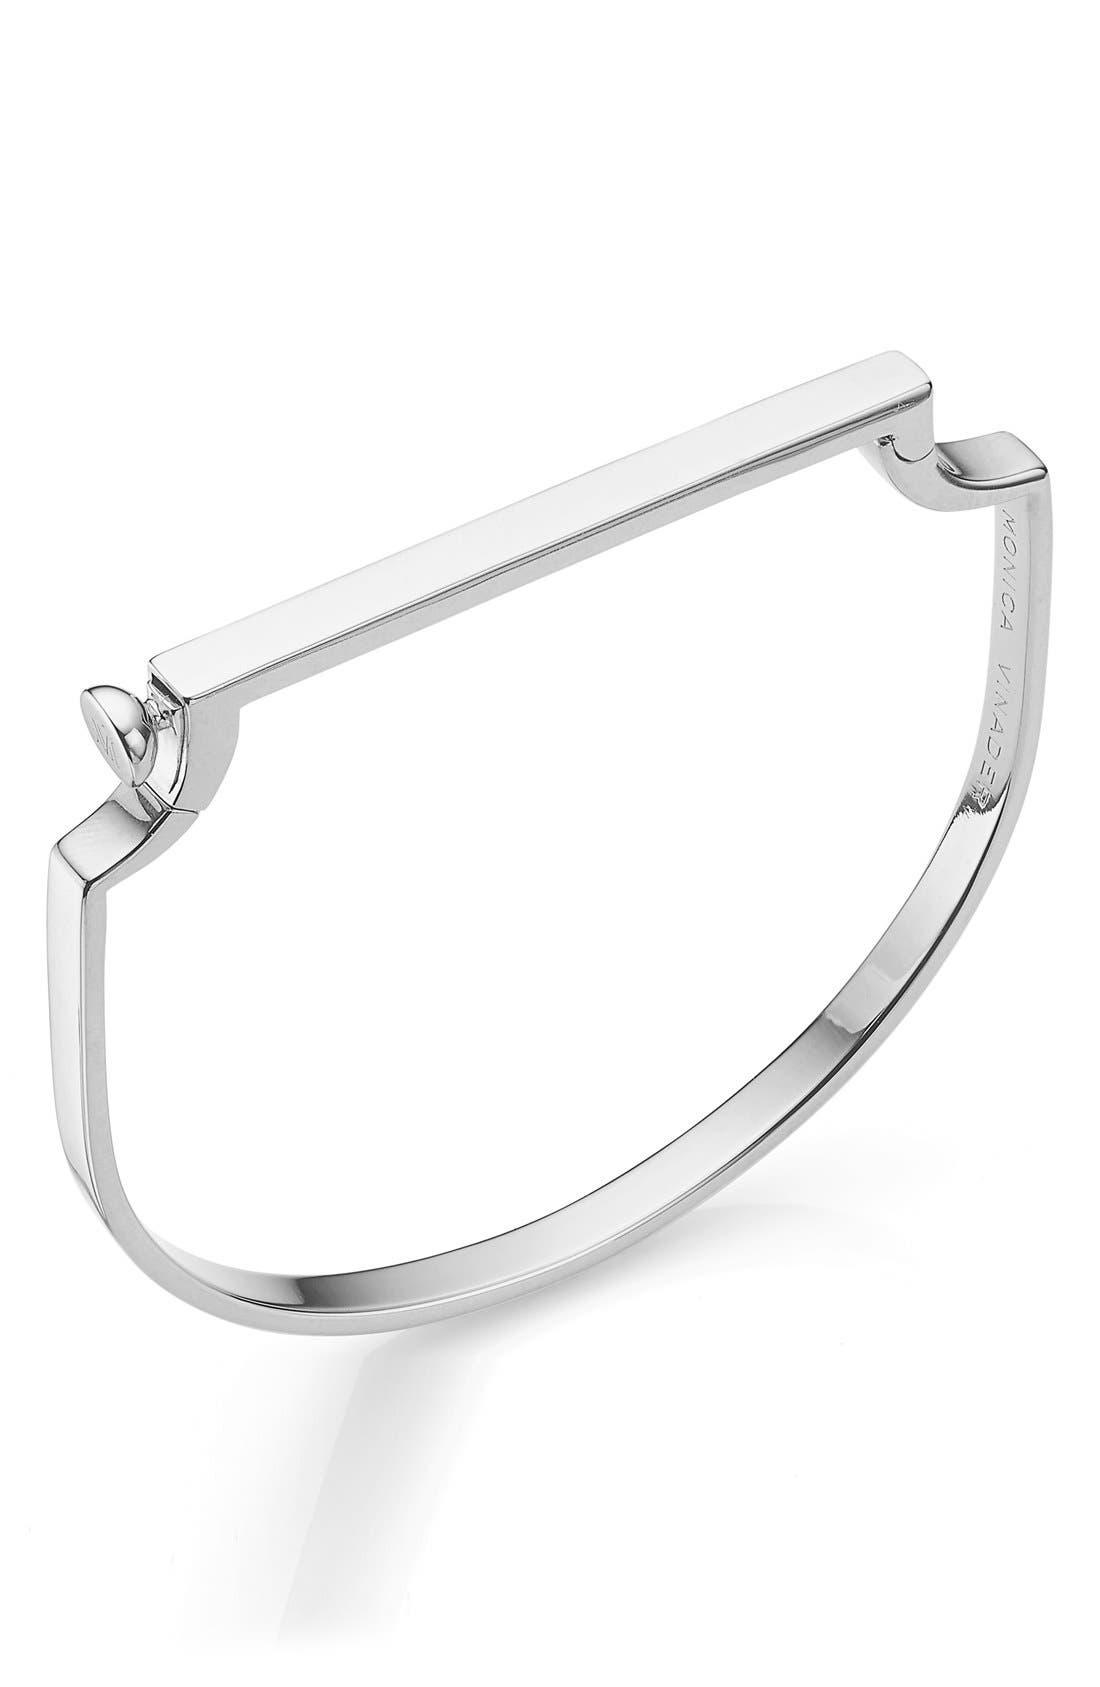 Engravable Signature Thin Bangle,                         Main,                         color, Silver